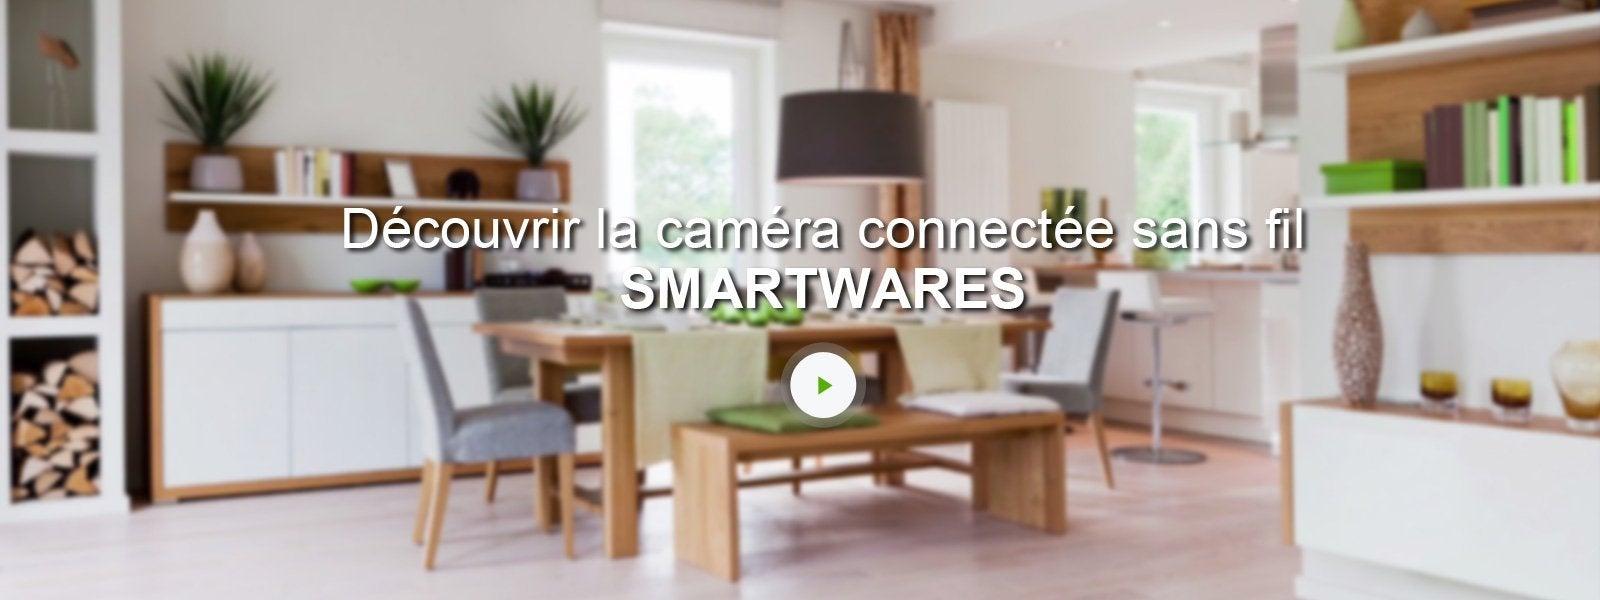 cam ra connect e sans fil ext rieure smartwares c924ip sw leroy merlin. Black Bedroom Furniture Sets. Home Design Ideas